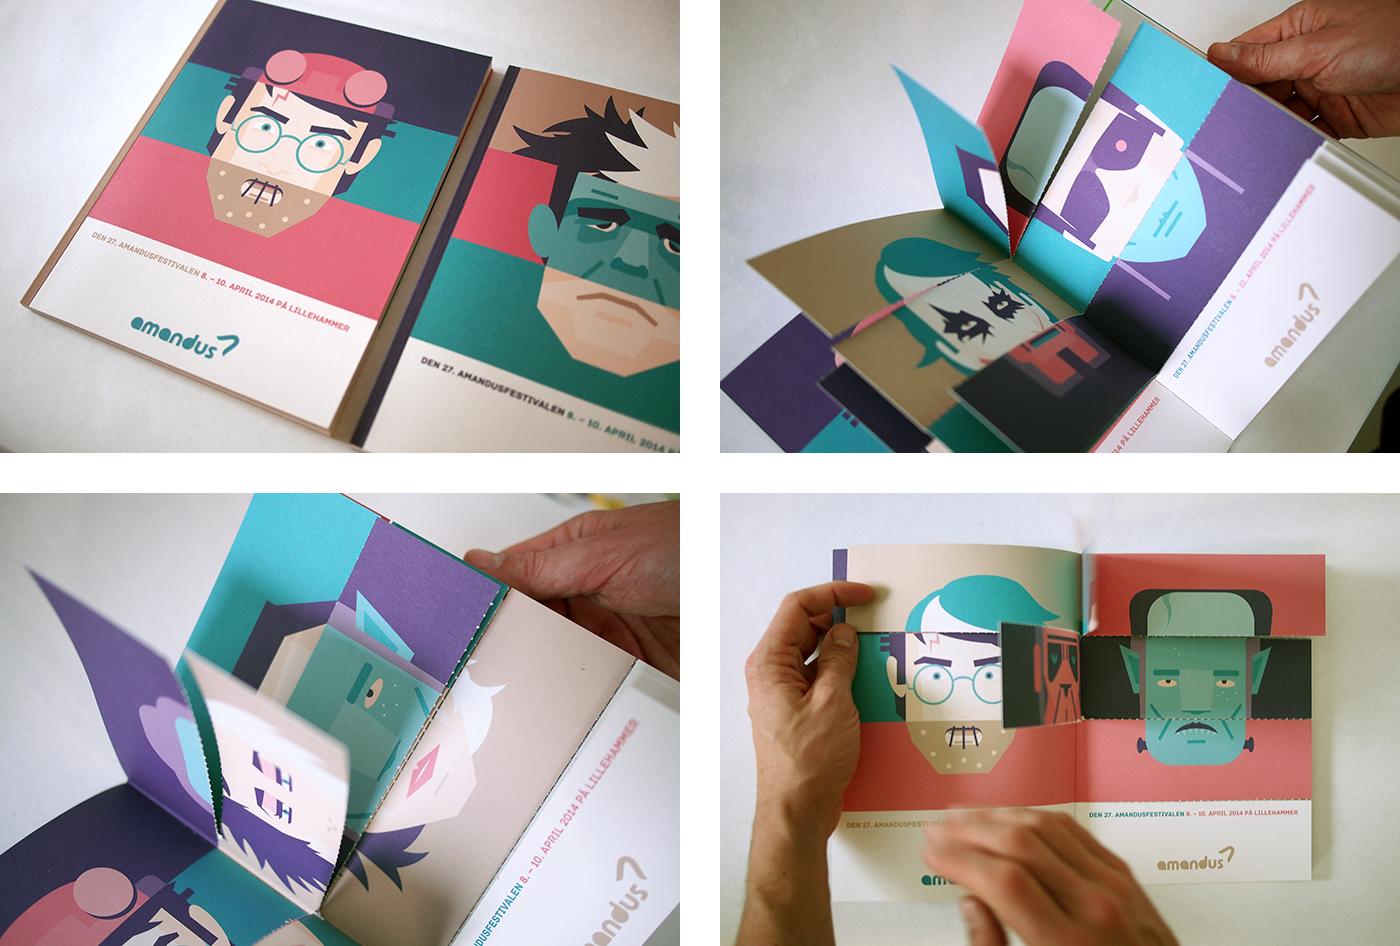 amandus film festival 2014 catalog design by upstruct